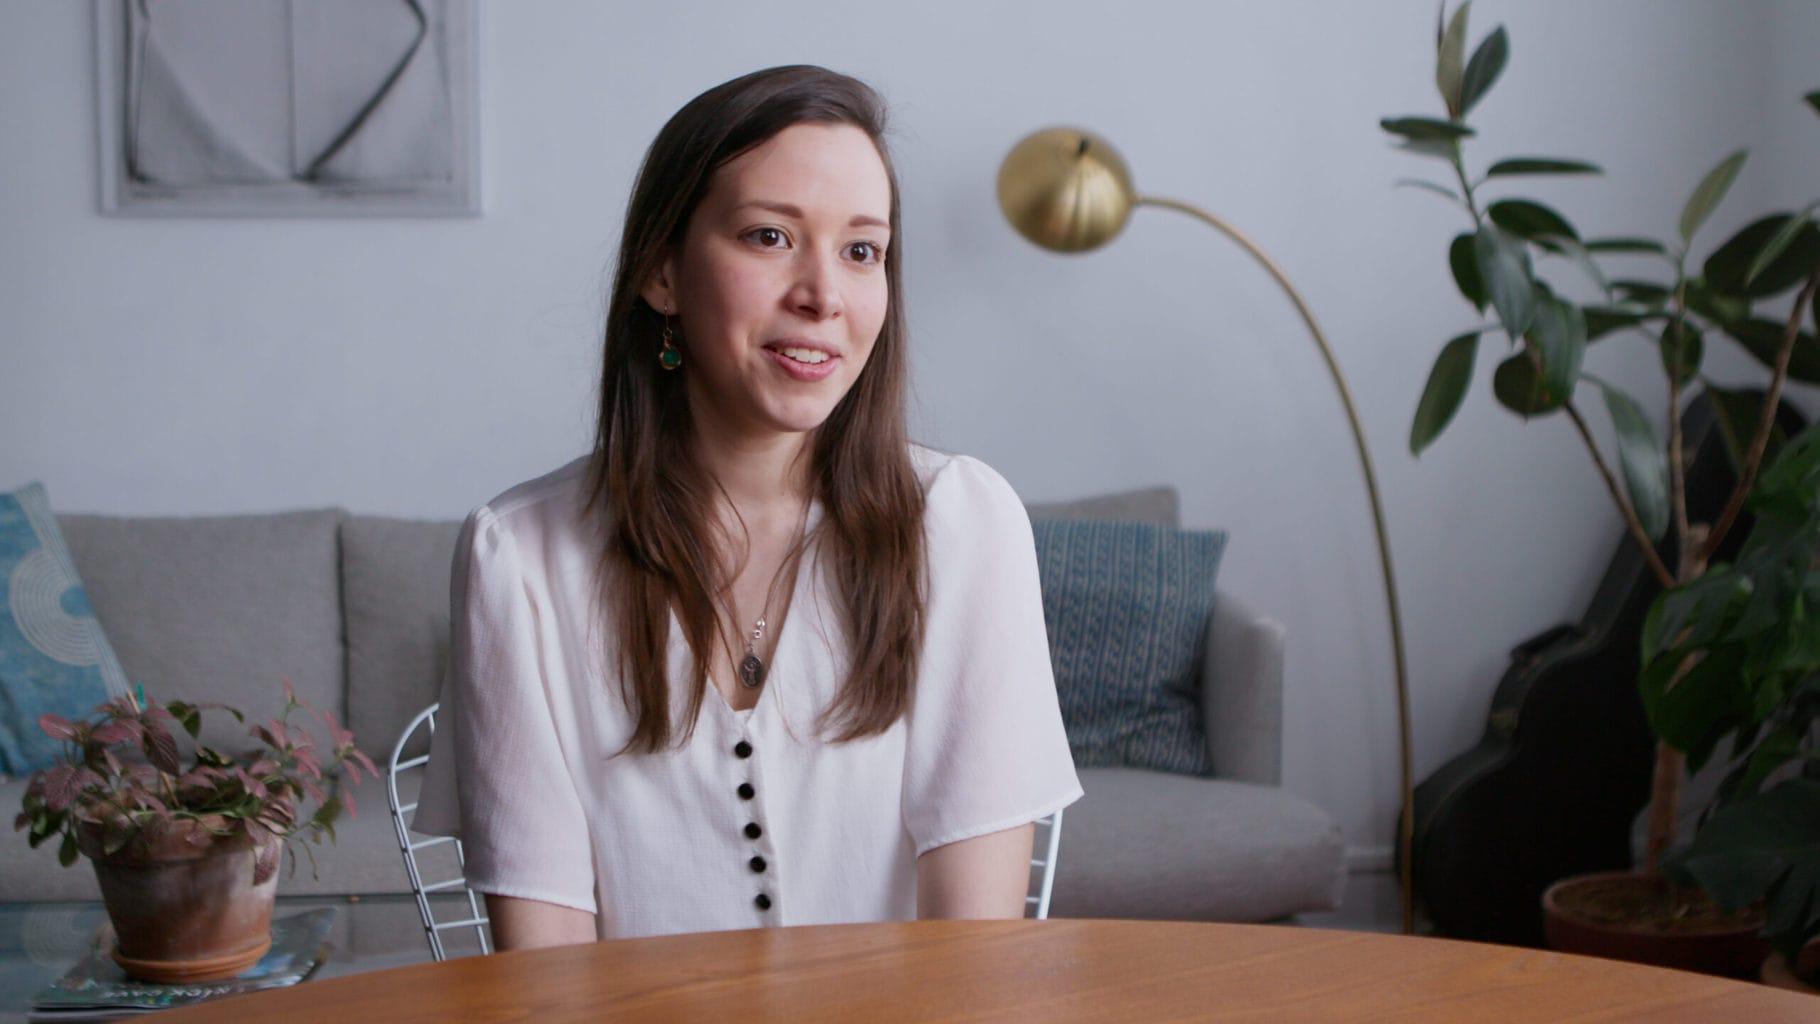 Daniela Blanco, co-founder of Sunthetics. Photo: Future of Work Film Inc.